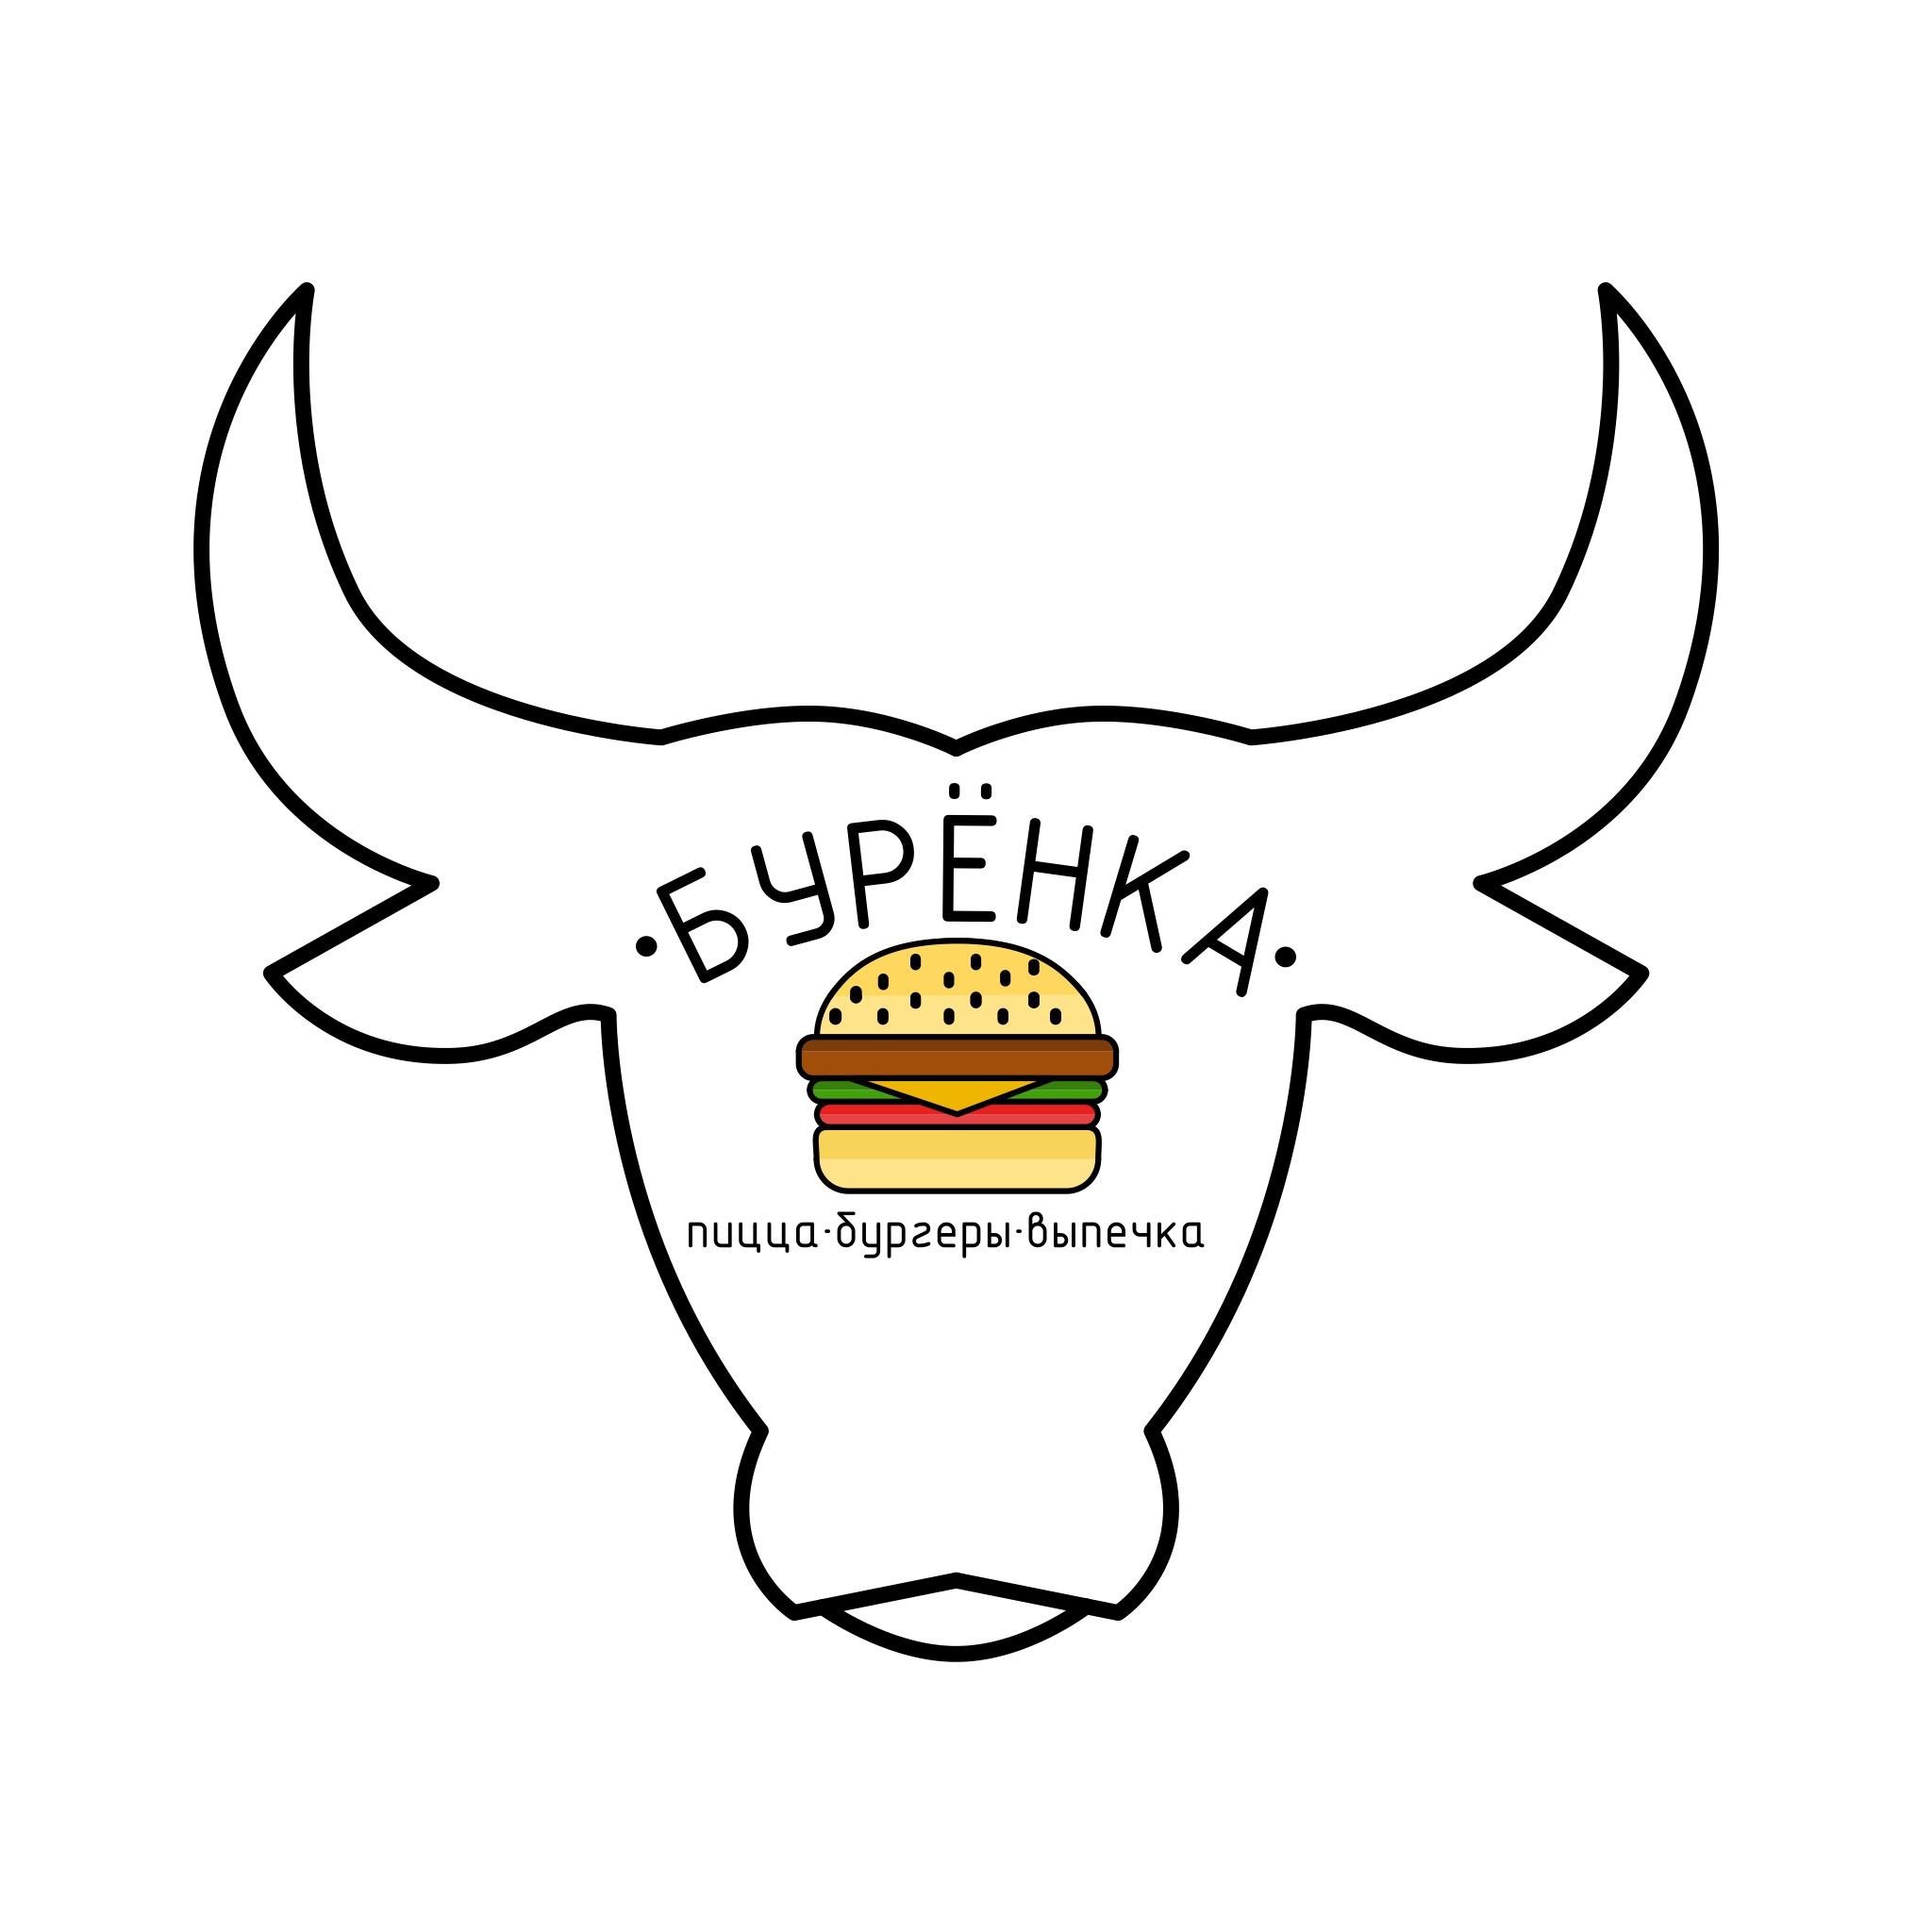 Логотип для Бургерной с Пекарней фото f_3625e10b36a62531.jpg